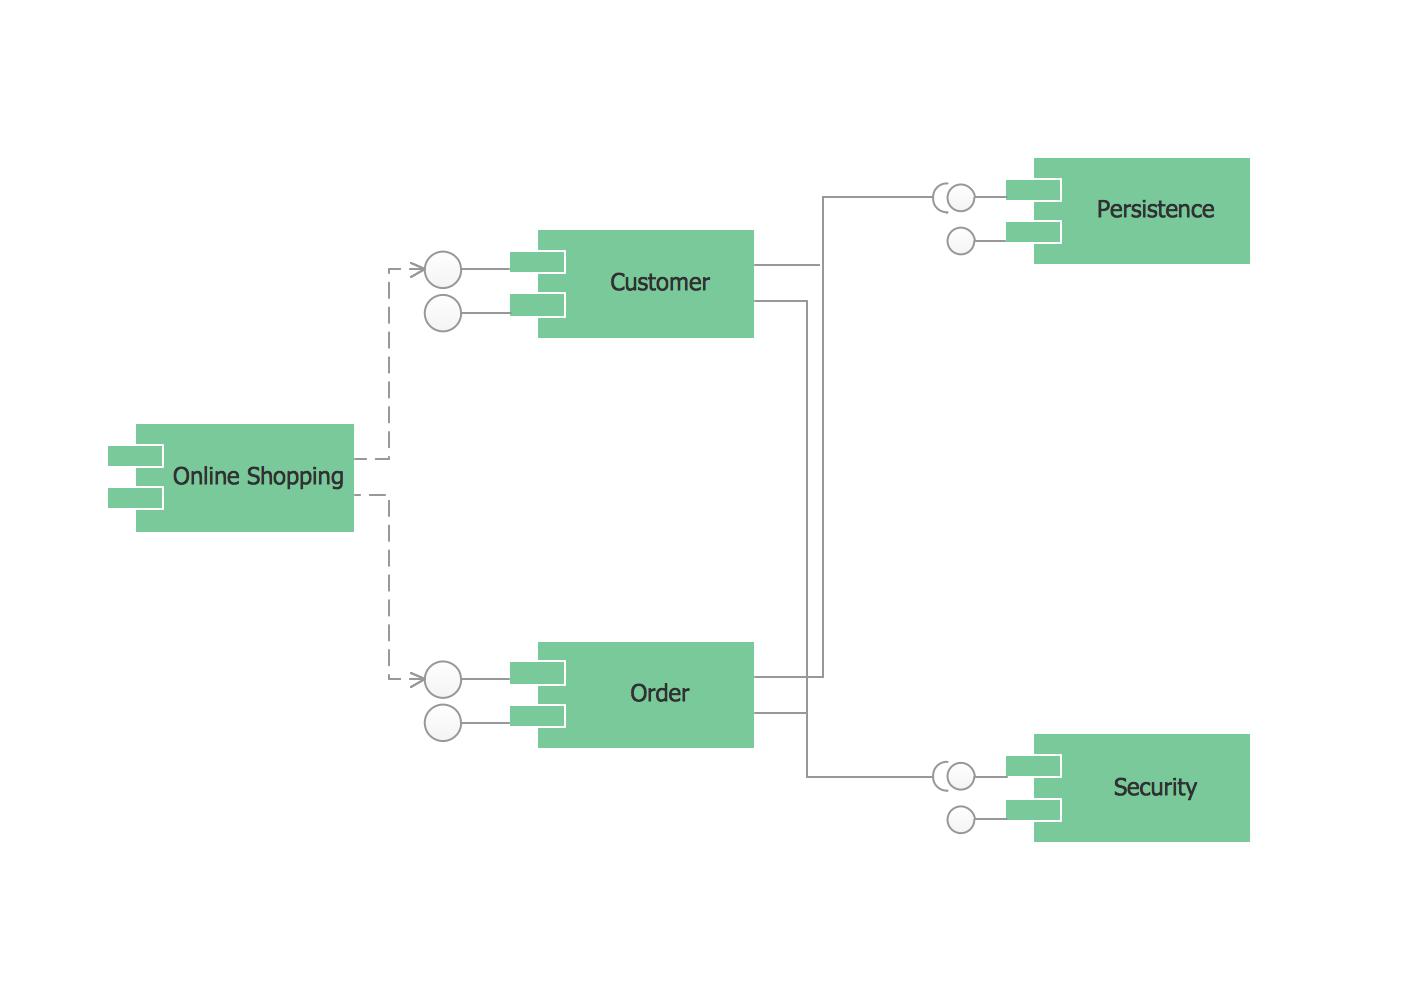 Uml Component Diagram Example - Online Shopping | Uml ...